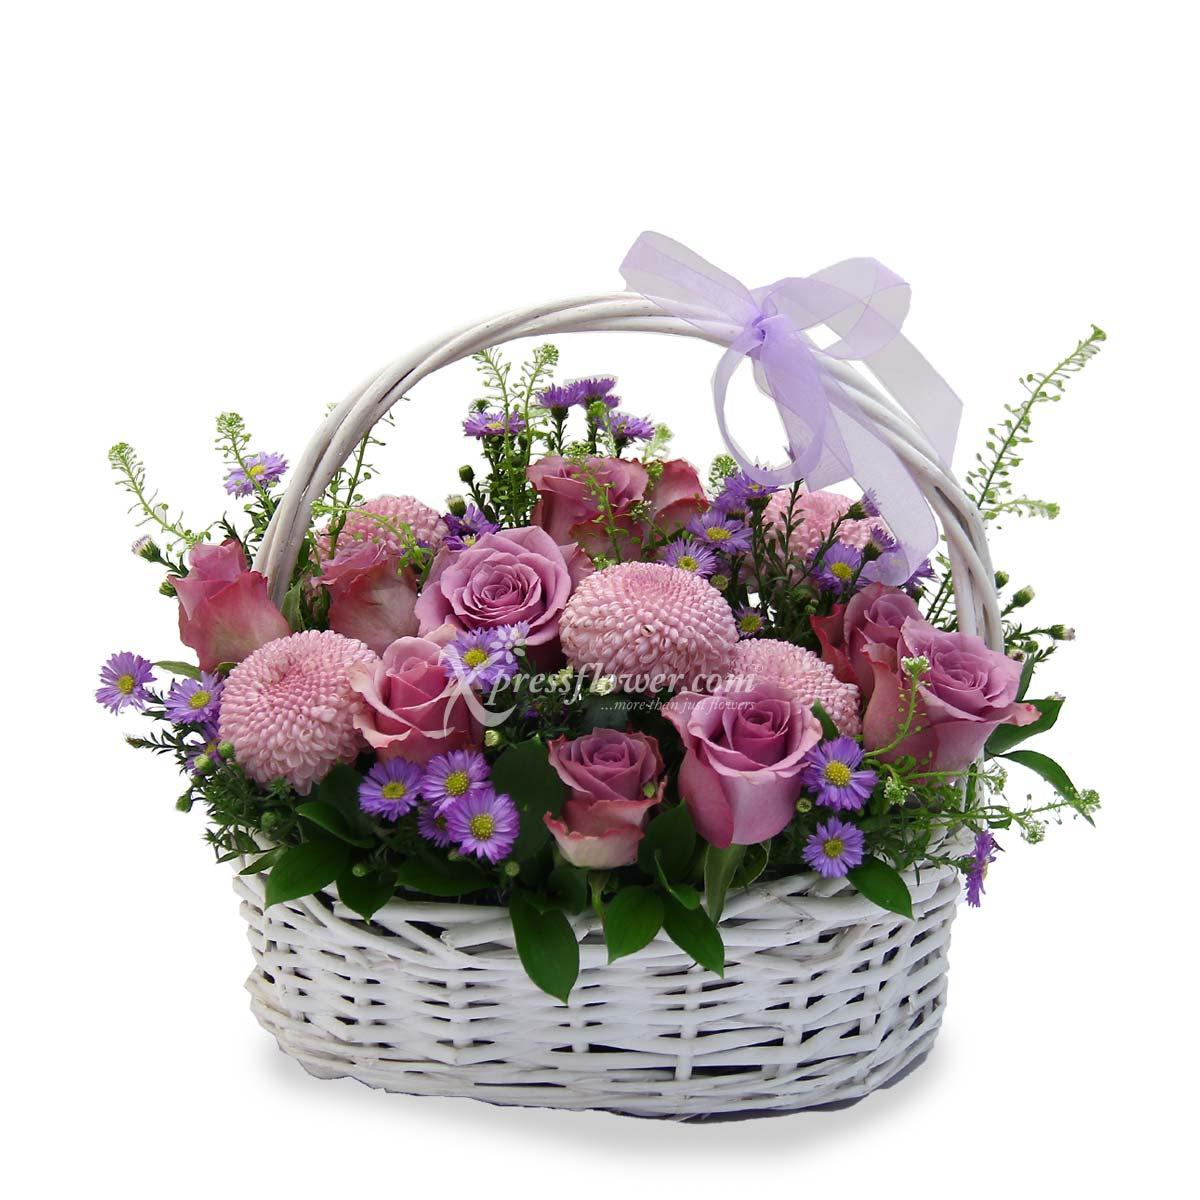 Garden Blooms (12 yam roses)